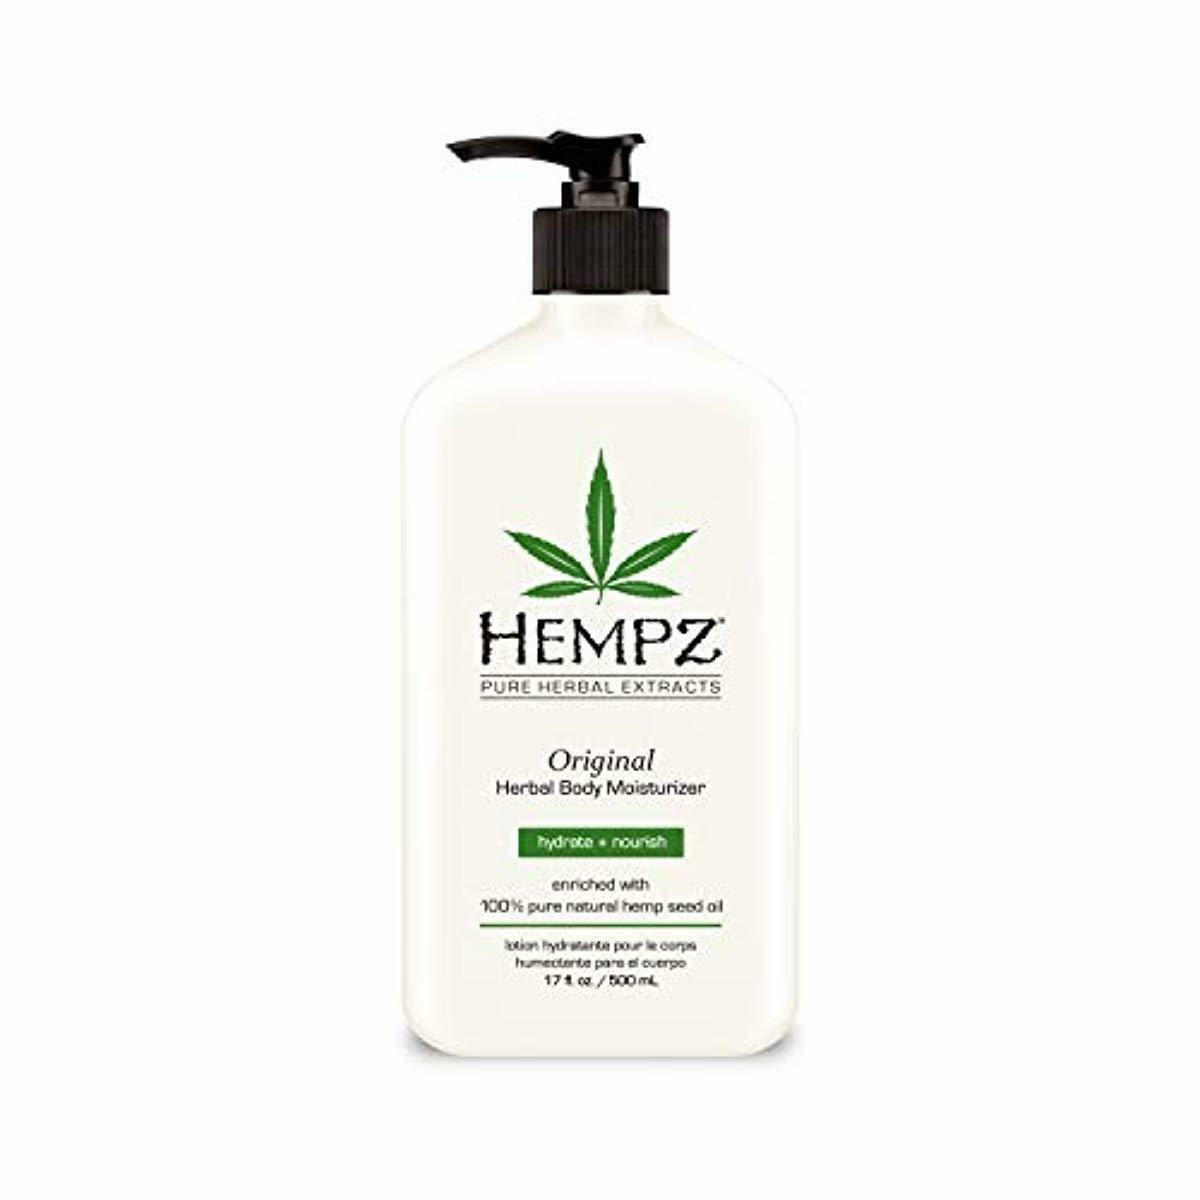 Original Natural Hemp Seed Oil Body Moisturizer with Shea Bu